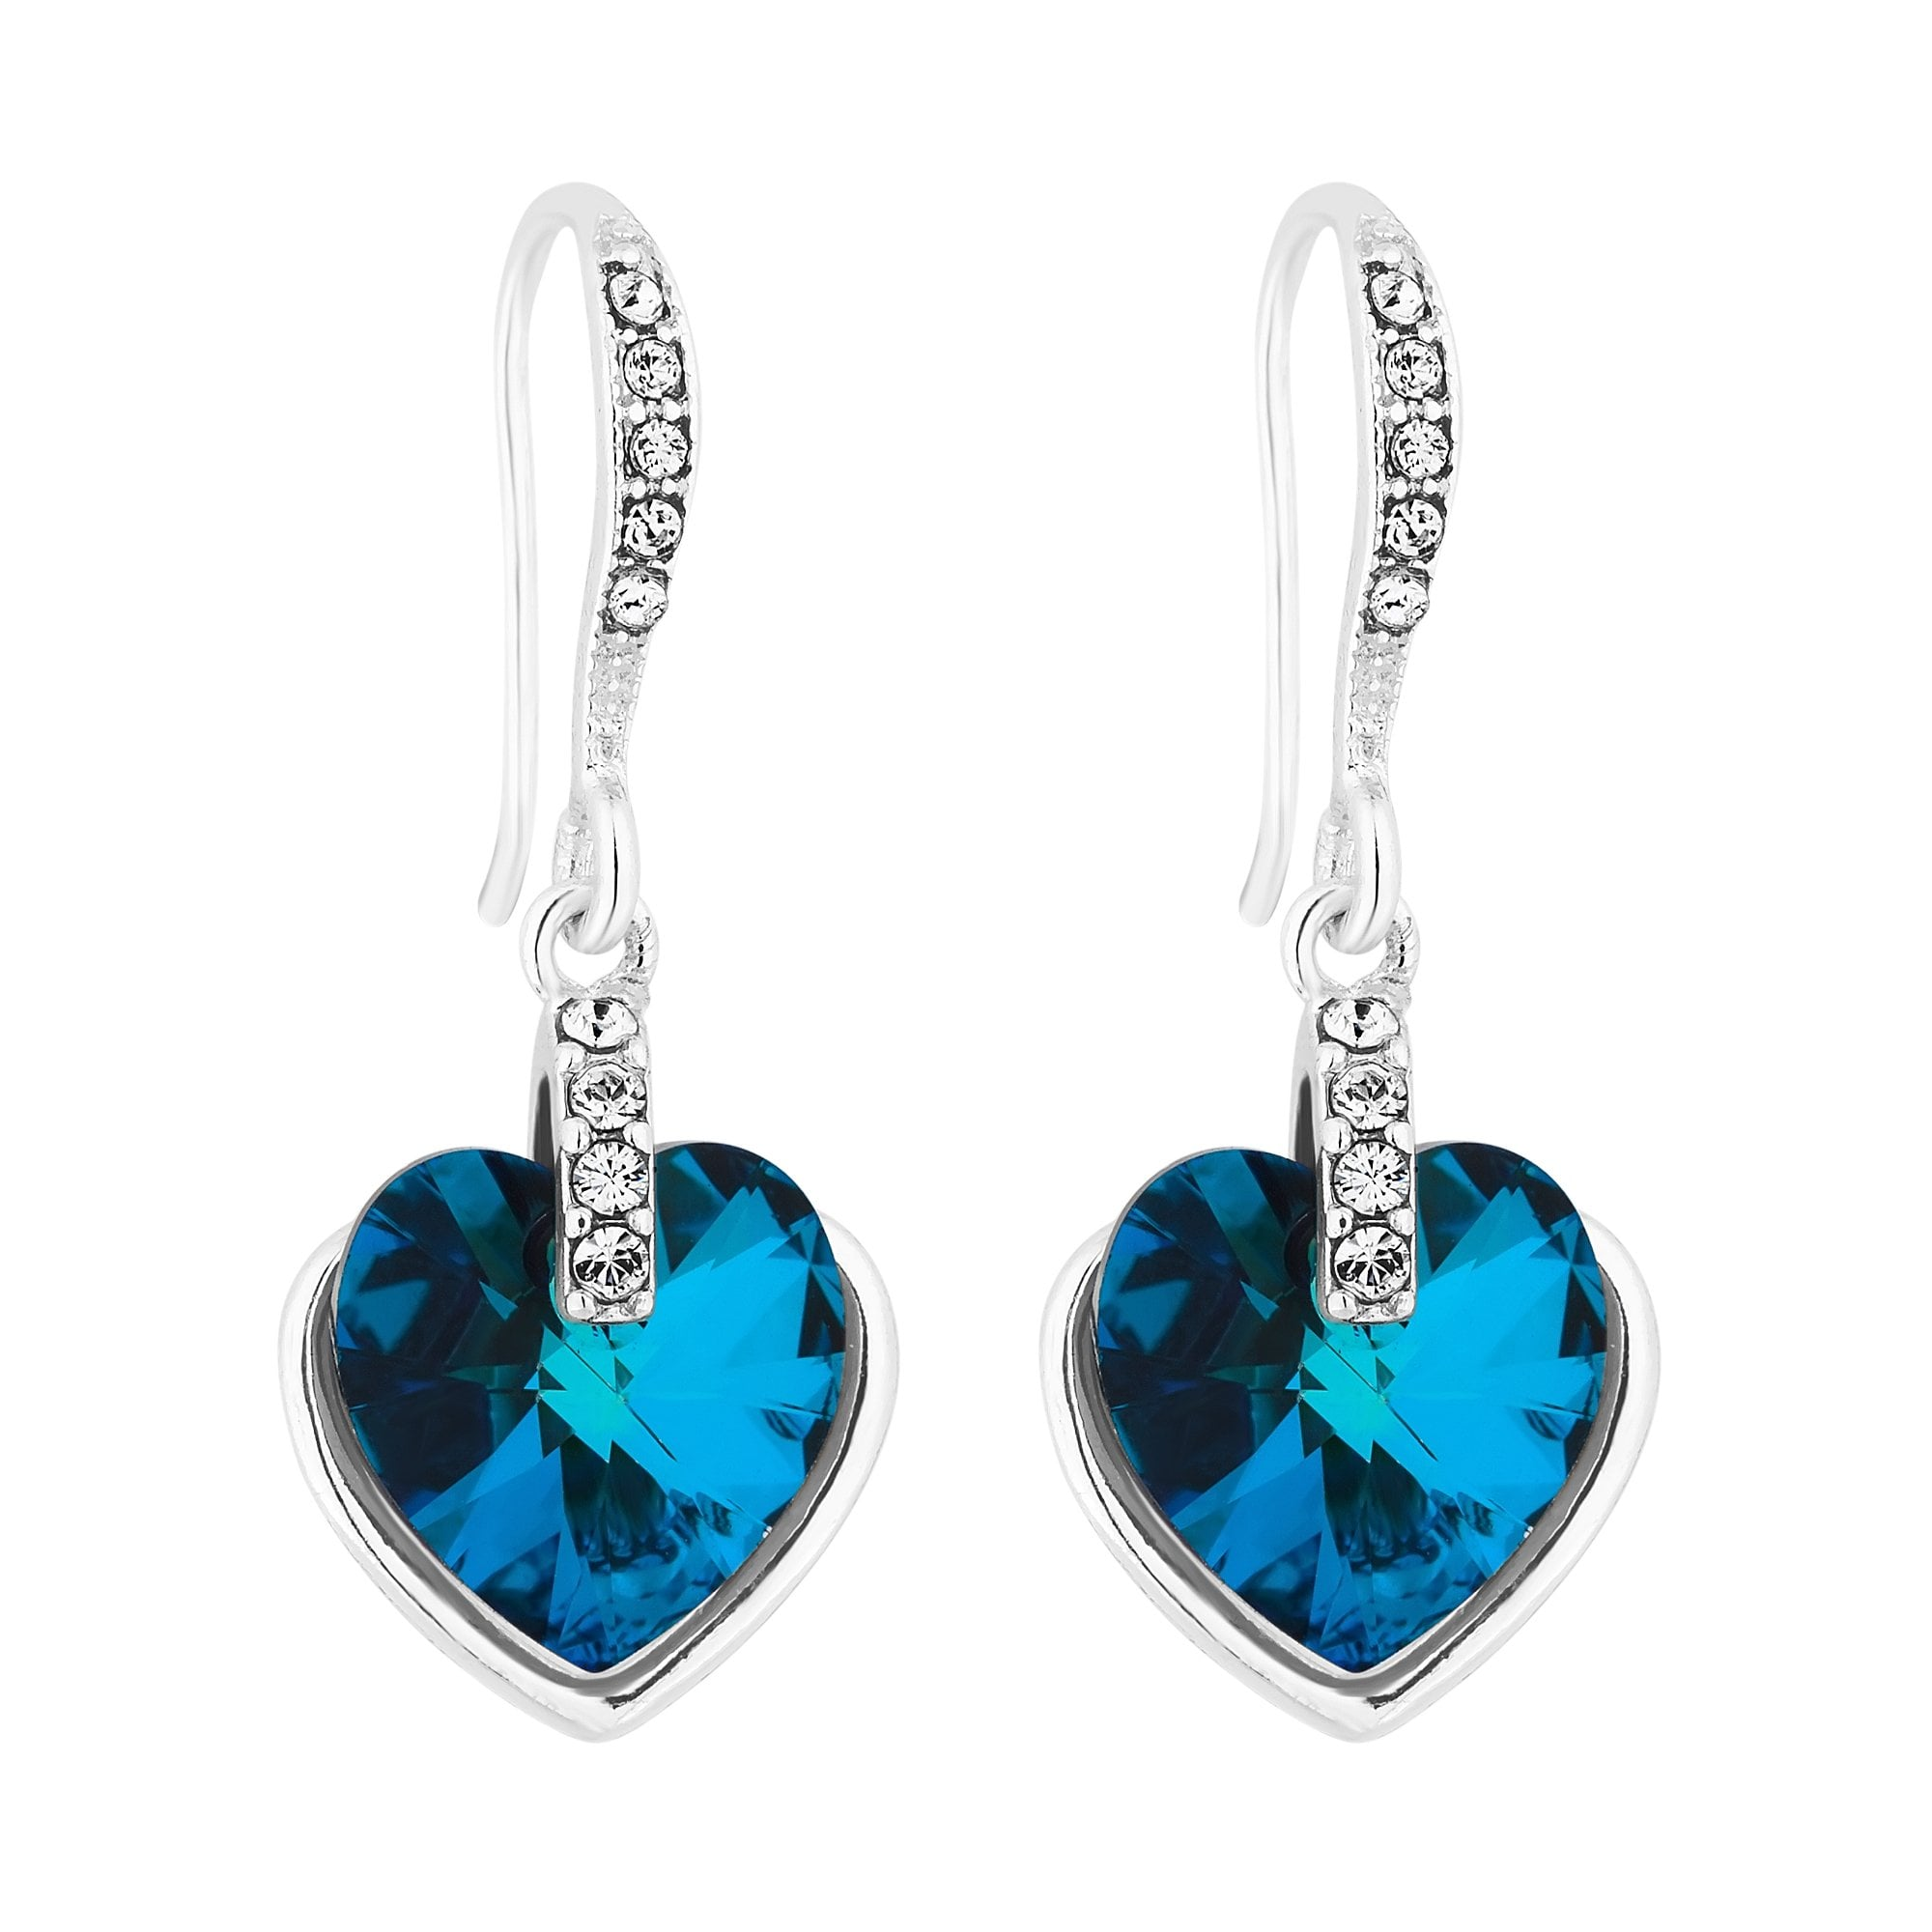 8427b0d2eb1875 Jon richard made with swarovski crystals silver bermuda blue heart drop  earring embellished with swarovski crystals